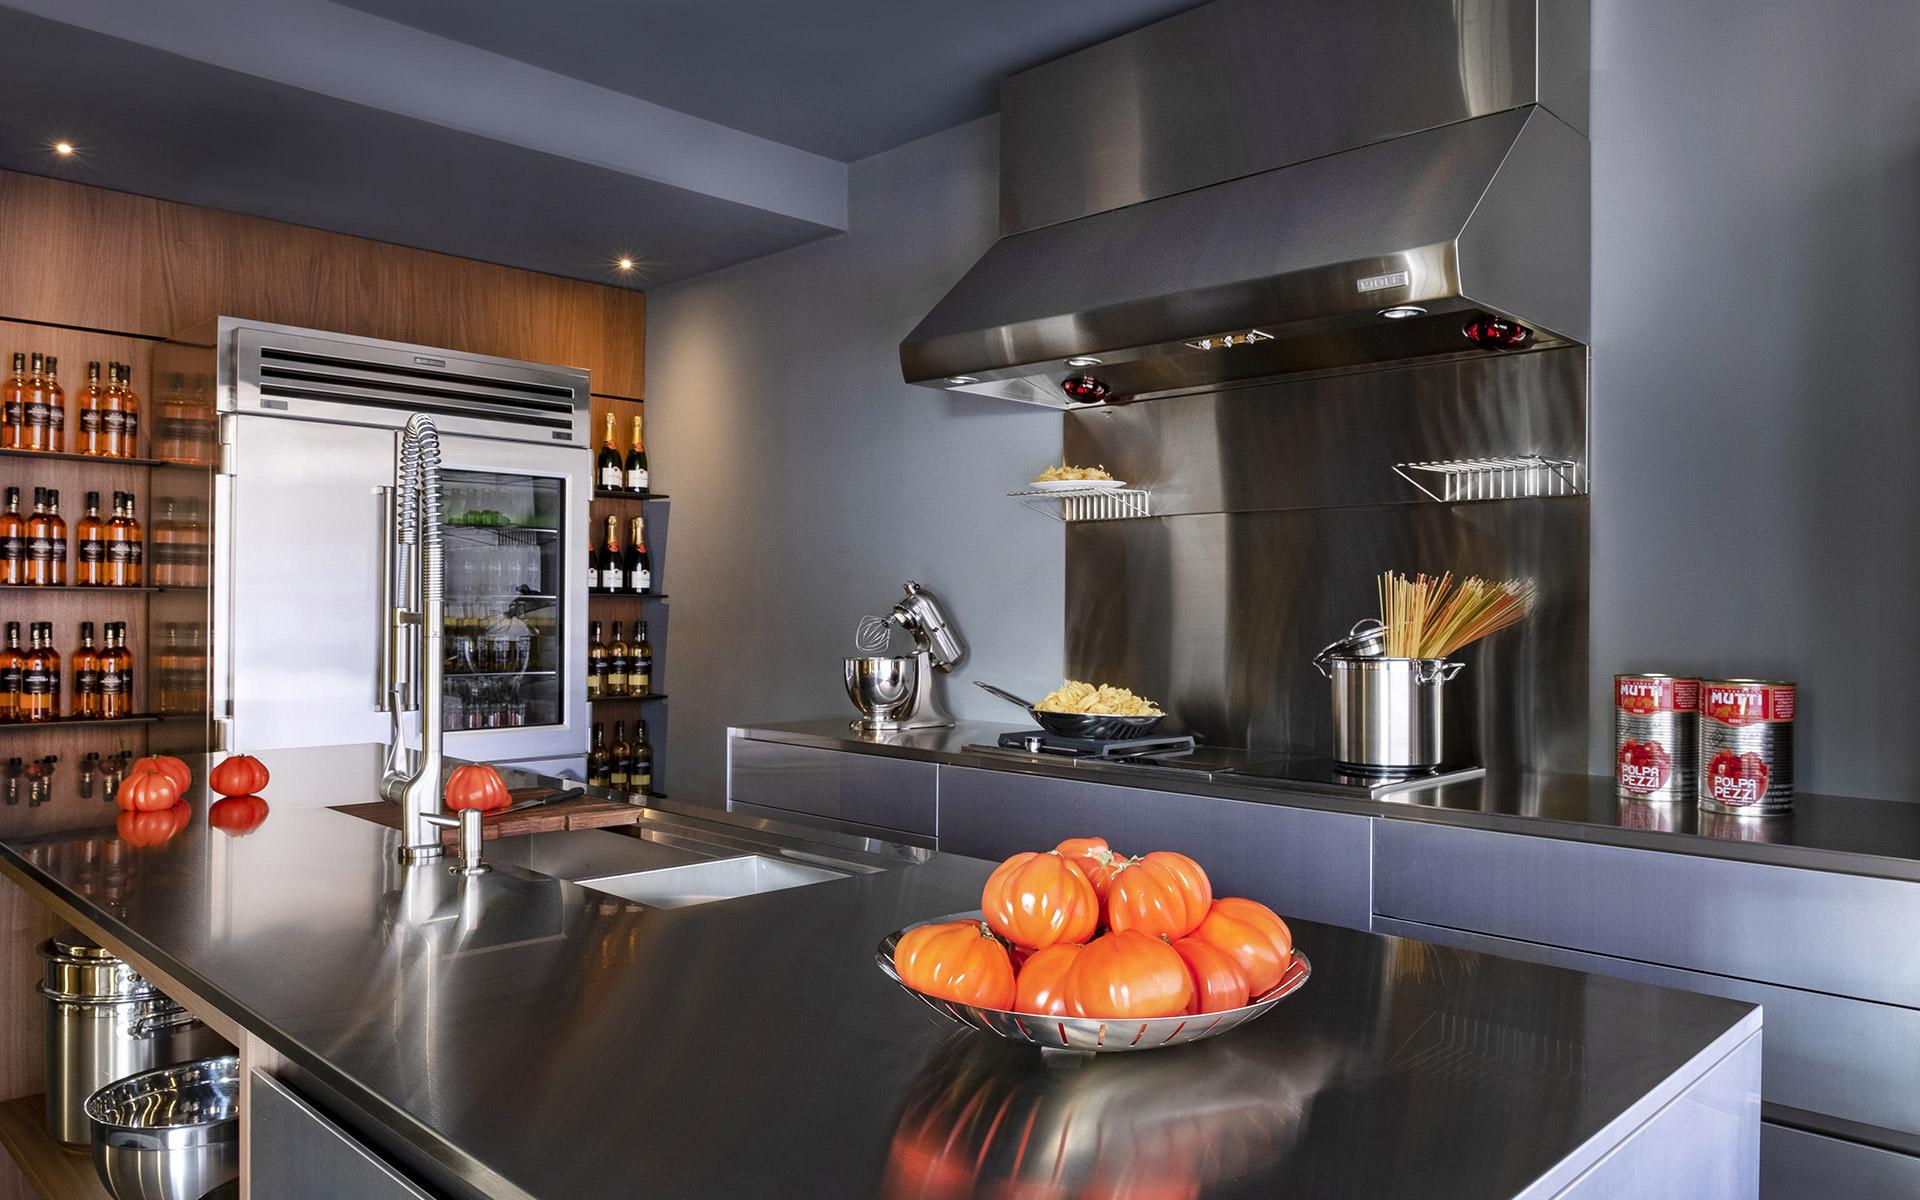 Cuisine professionnel et semi-professionnel